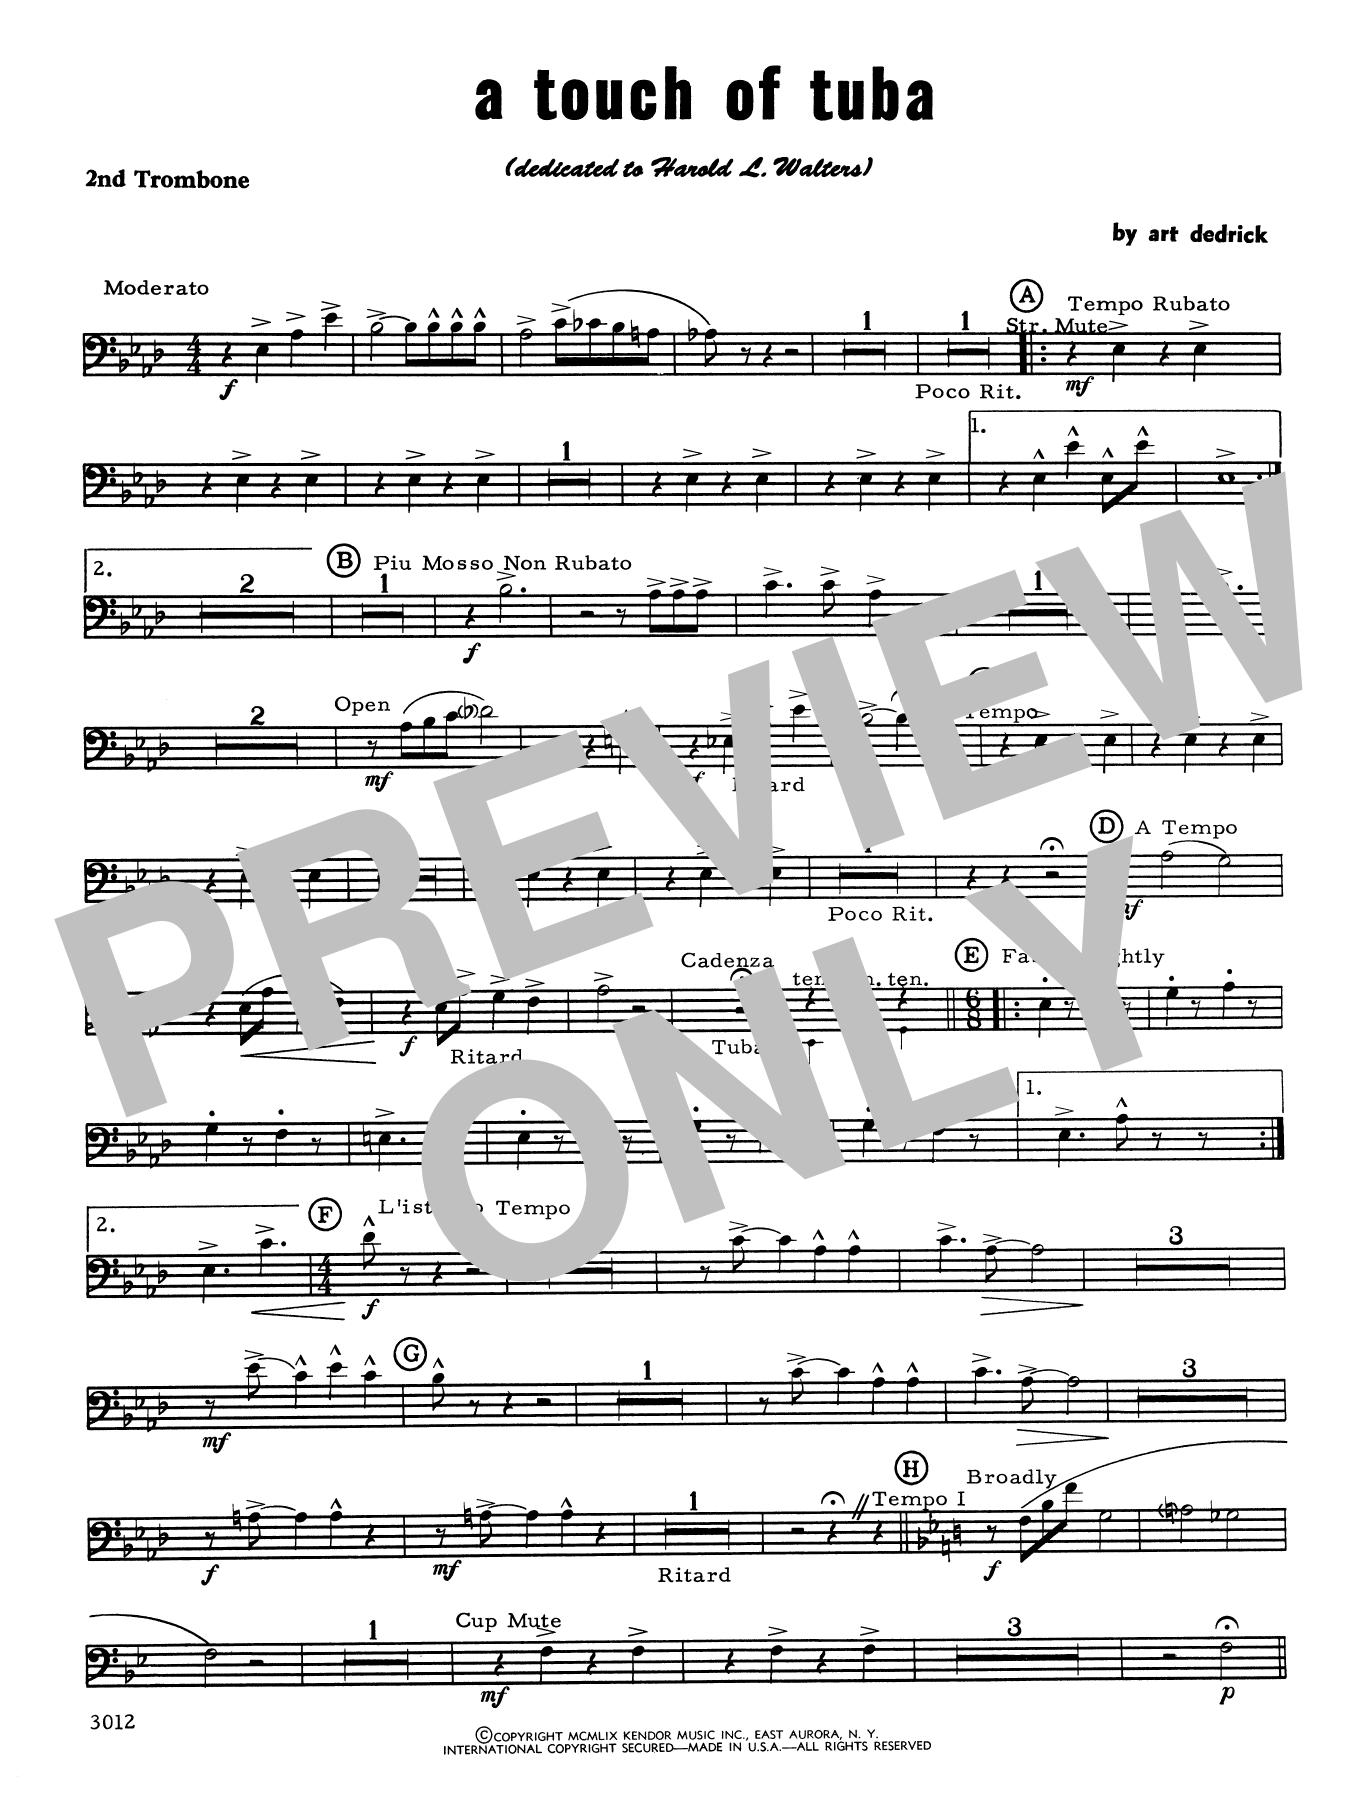 Art Dedrick A Touch Of Tuba - 2nd Trombone sheet music notes printable PDF score